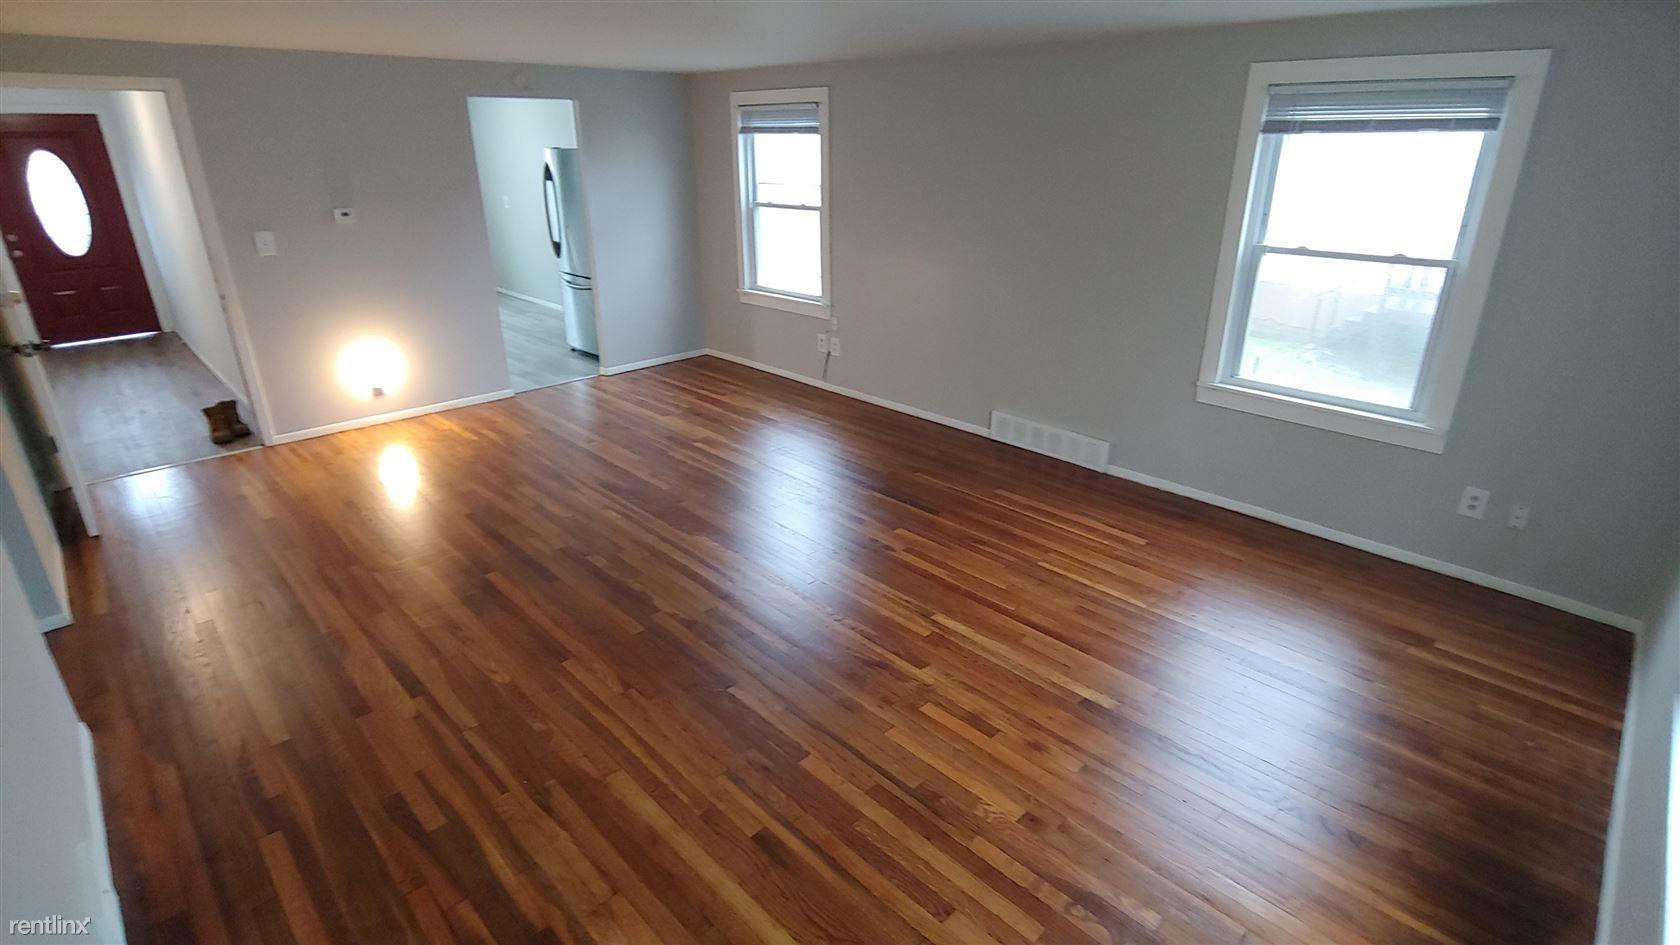 150 Masarik Ave, Stratford, CT - $1,600 USD/ month